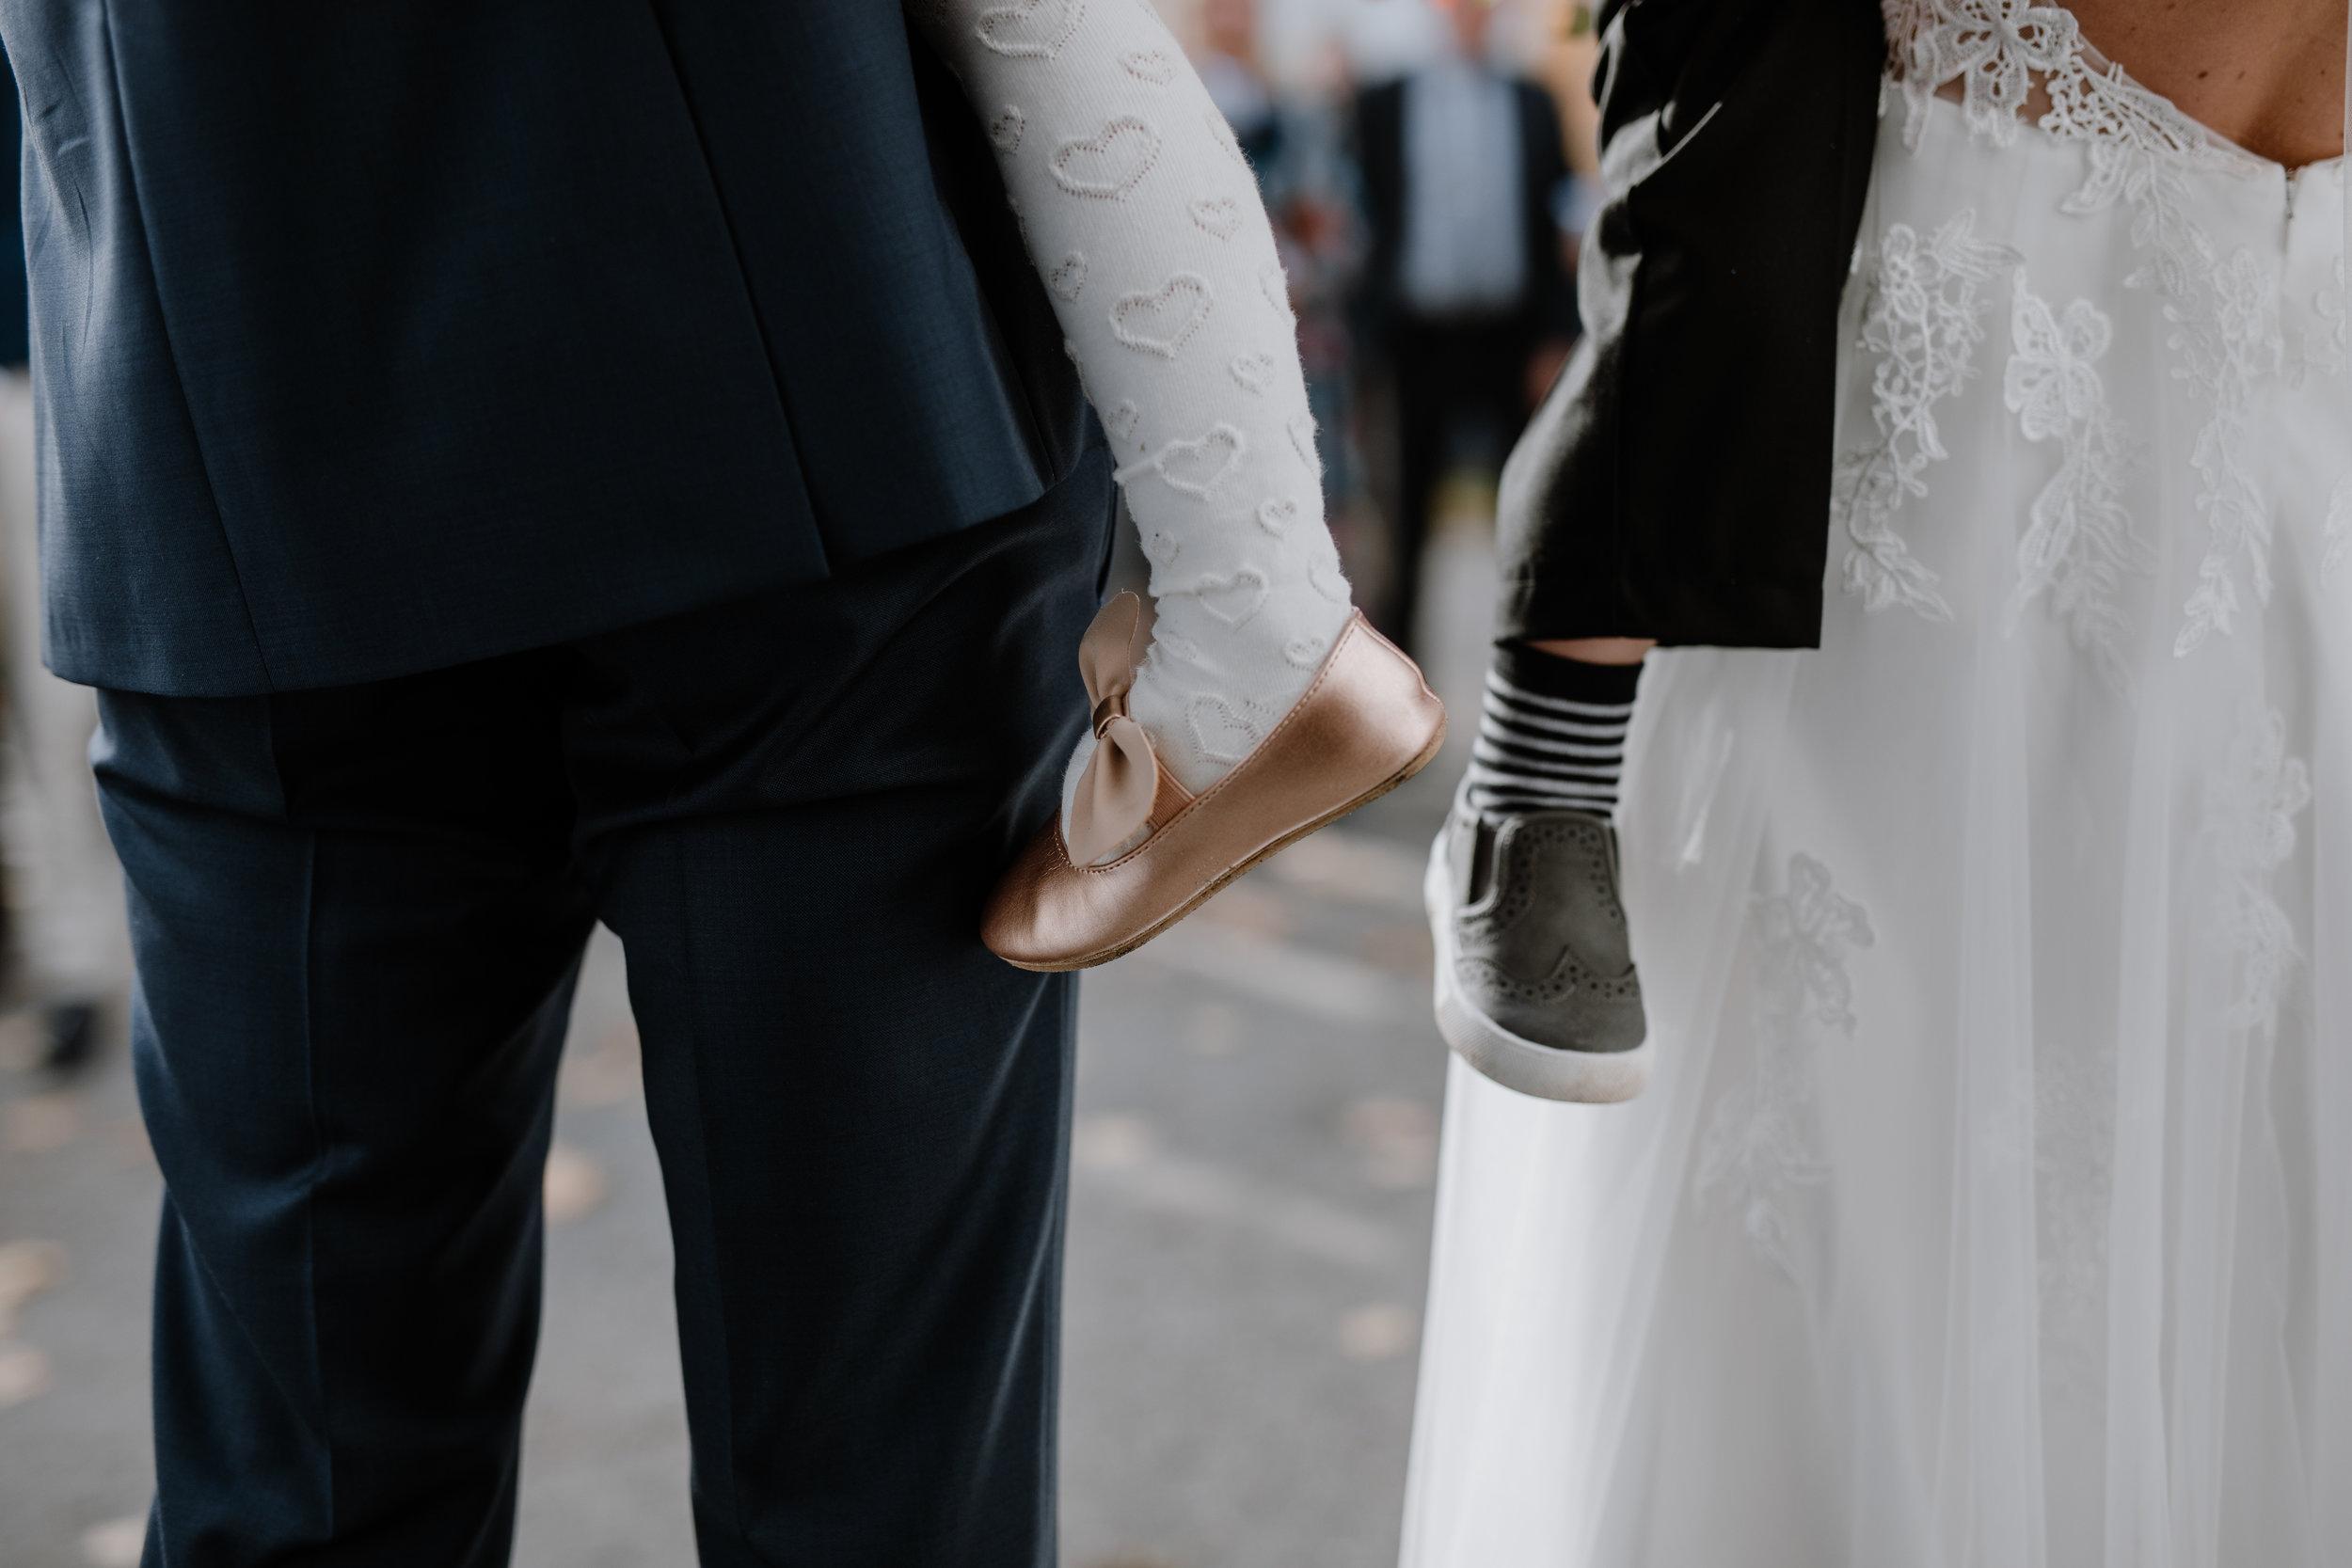 Bröllopsfotograf-Uddetorp Säteri-Höstbröllop-Fotograf Emilia- Bröllopsfotograf Borås-43.jpg